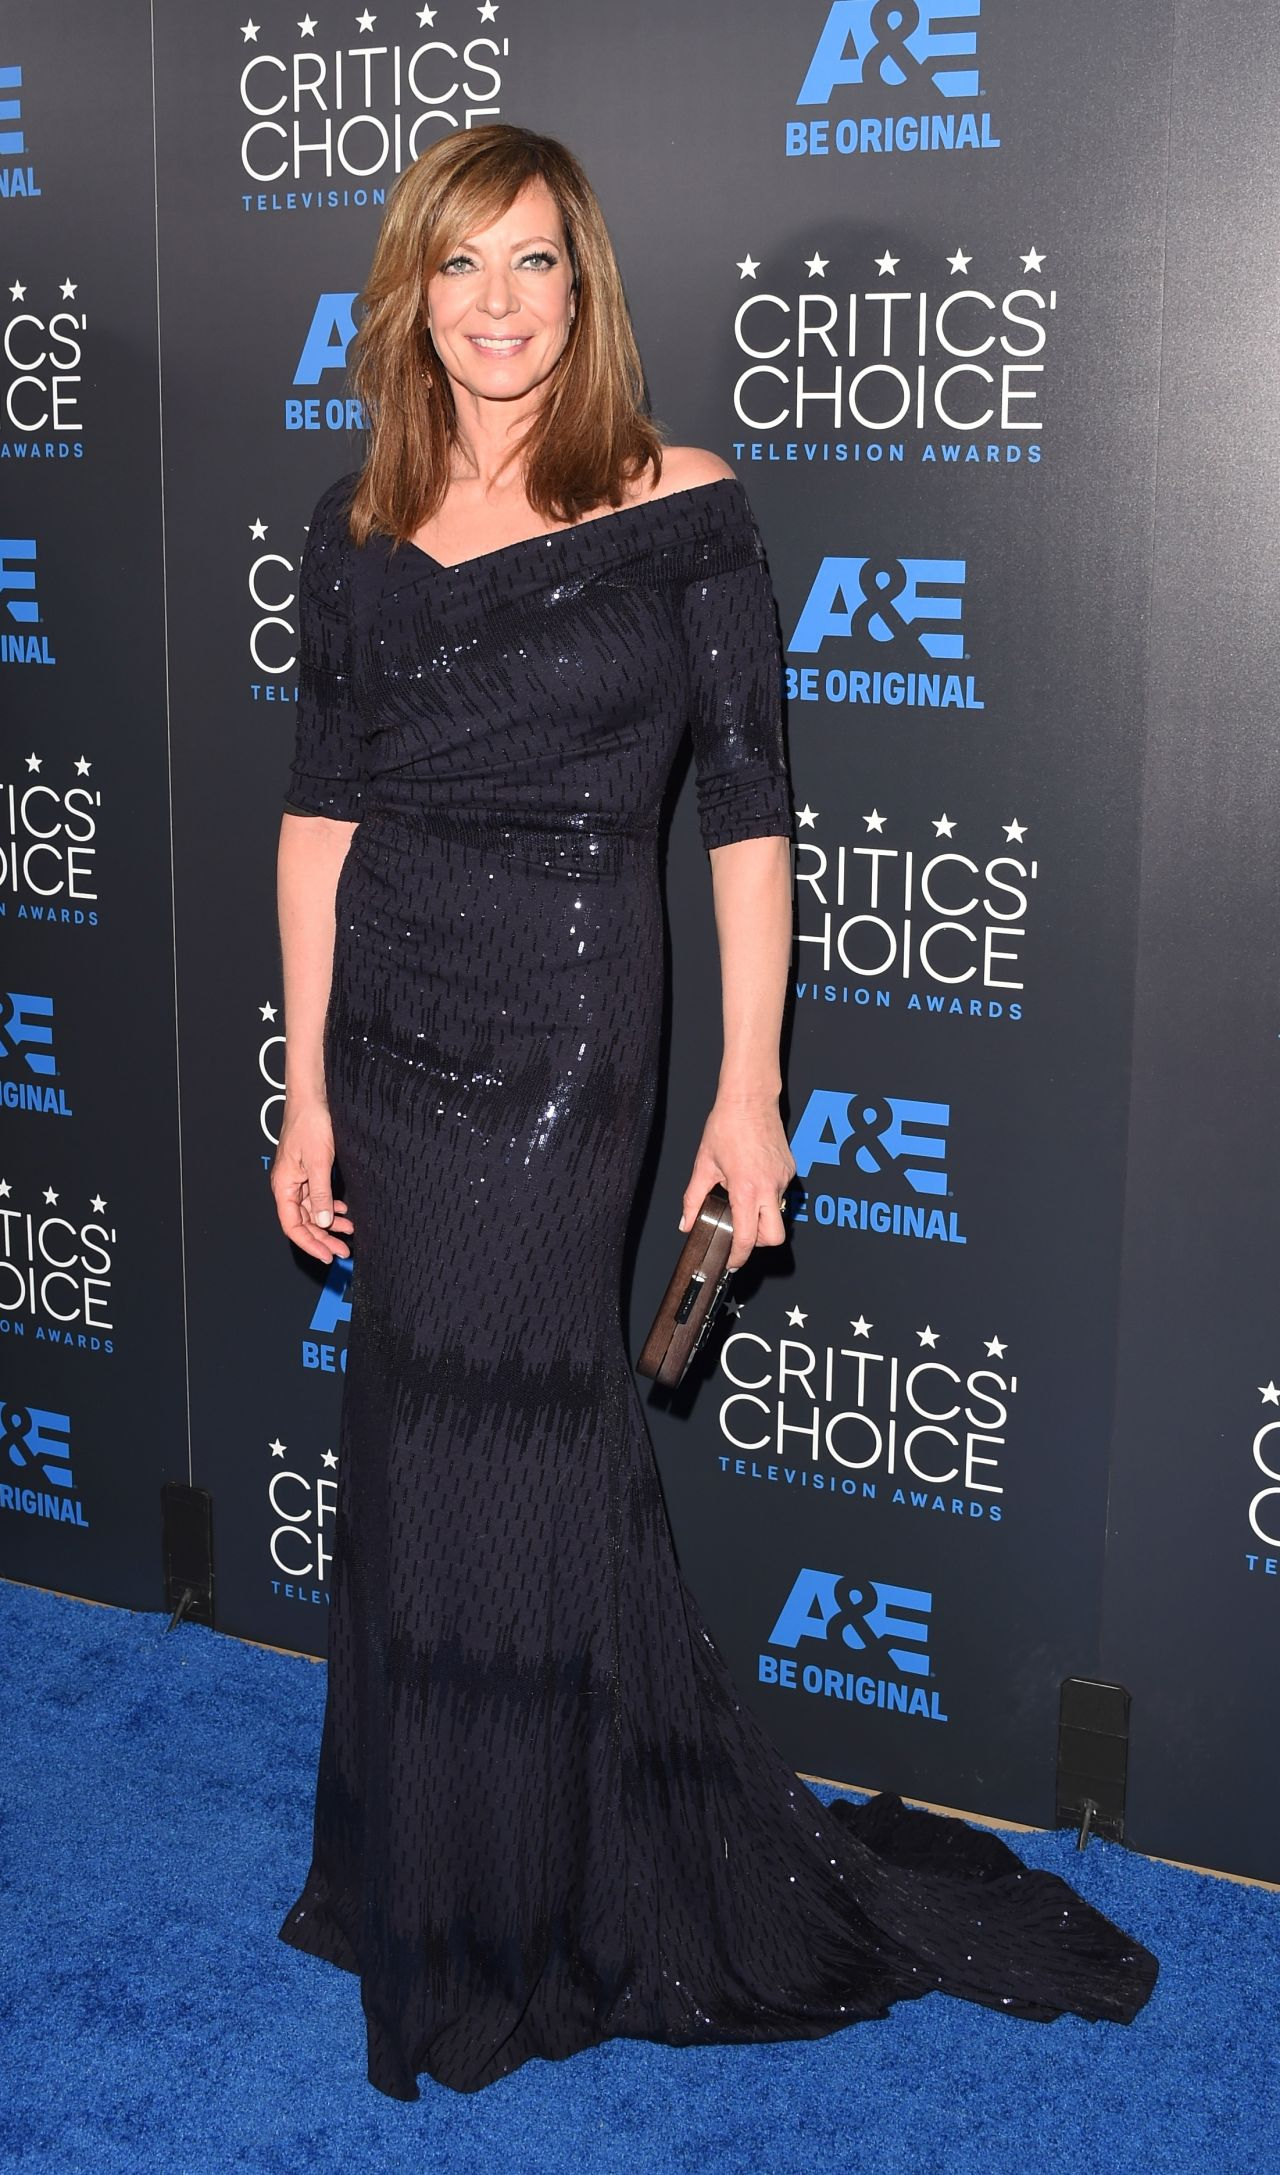 allison-janney-2015-critics-choice-television-awards-in-beverly-hills_1.jpg